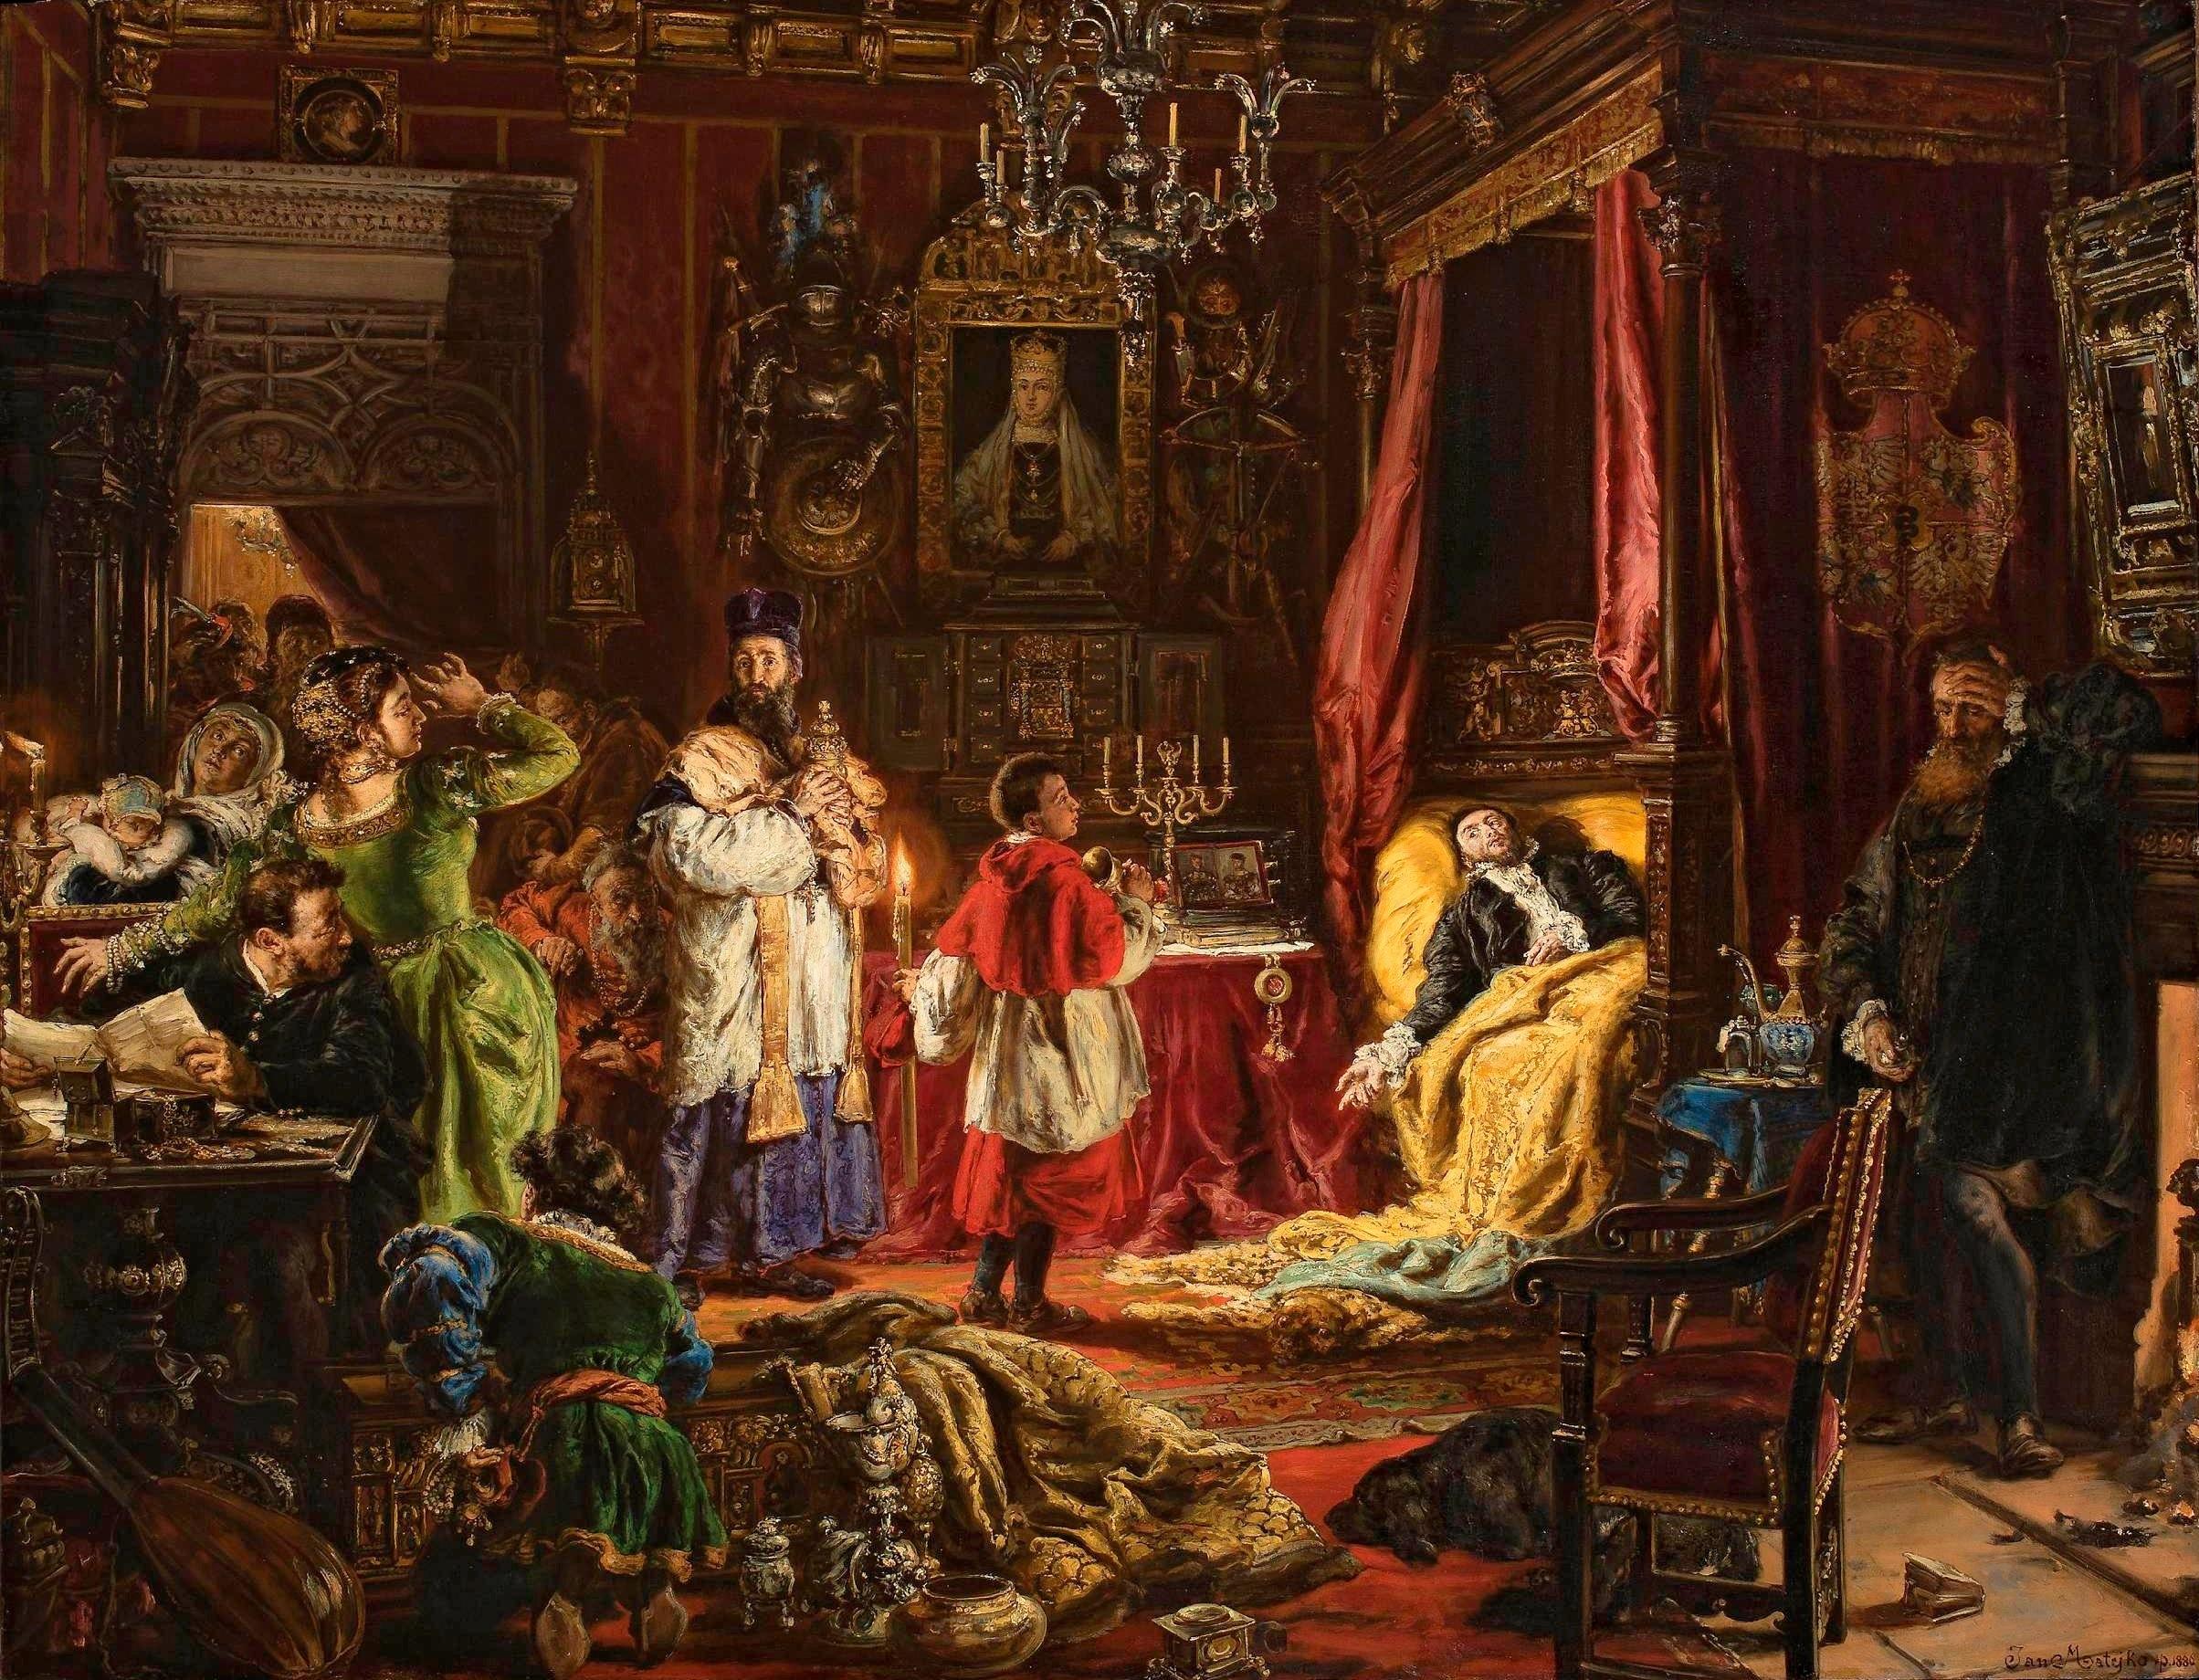 https://upload.wikimedia.org/wikipedia/commons/8/85/Death_of_Sigismund_Augustus_at_Knyszyn.JPG